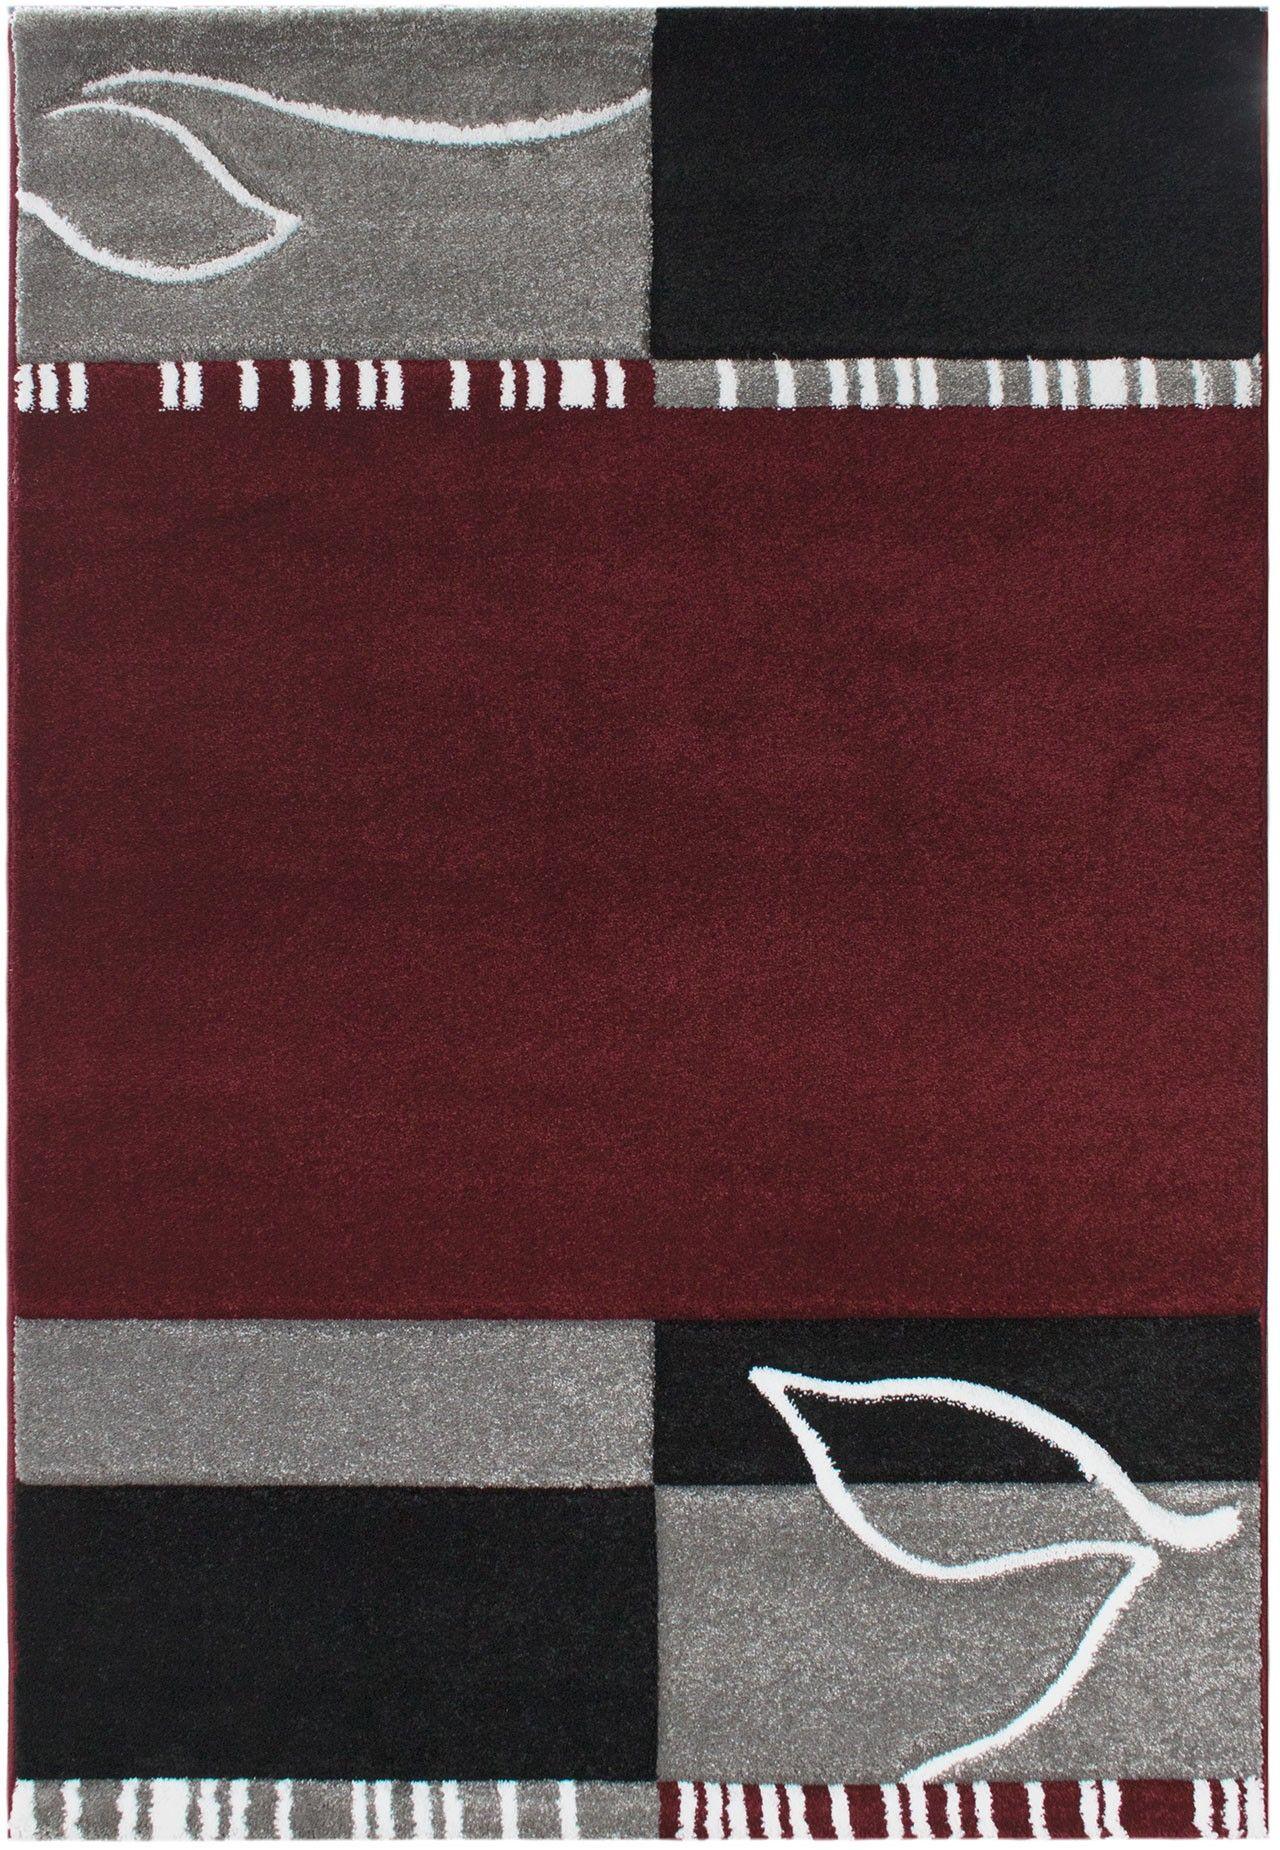 Florida 912 Rot Grau Teppich Carpet Modern Grau Beige Braun Weiss